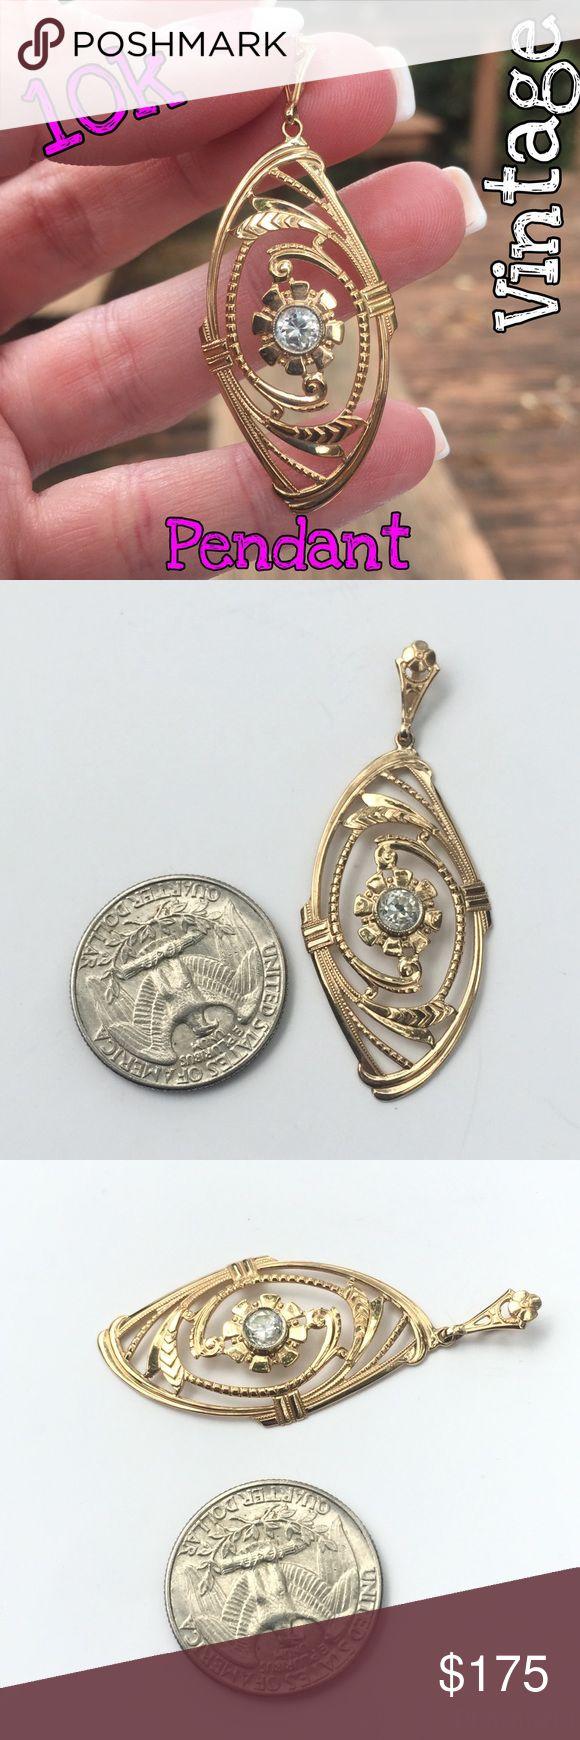 10k vtg large ornate clear stone flower pendant flower pendantwhat s thevintage jewelryshipsweightsstonespendantsjewelry necklacesyellow